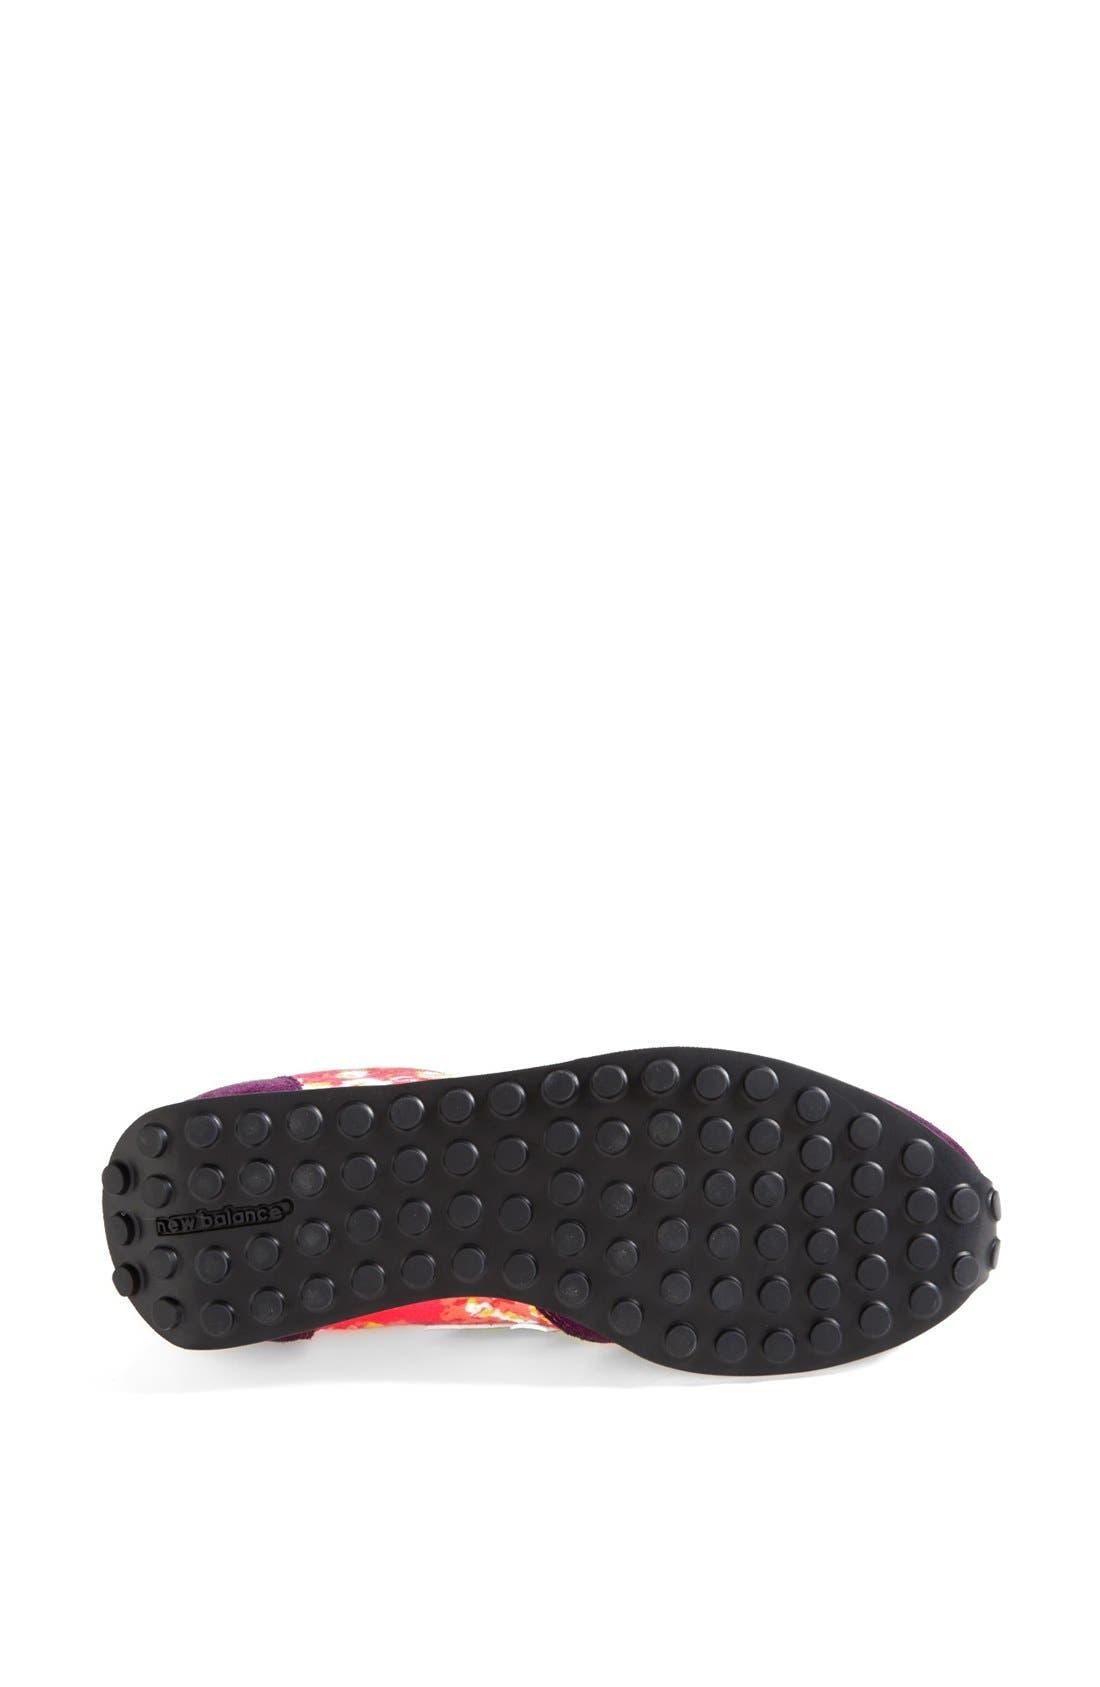 Alternate Image 4  - New Balance '410 Floral Blur' Sneaker (Women)